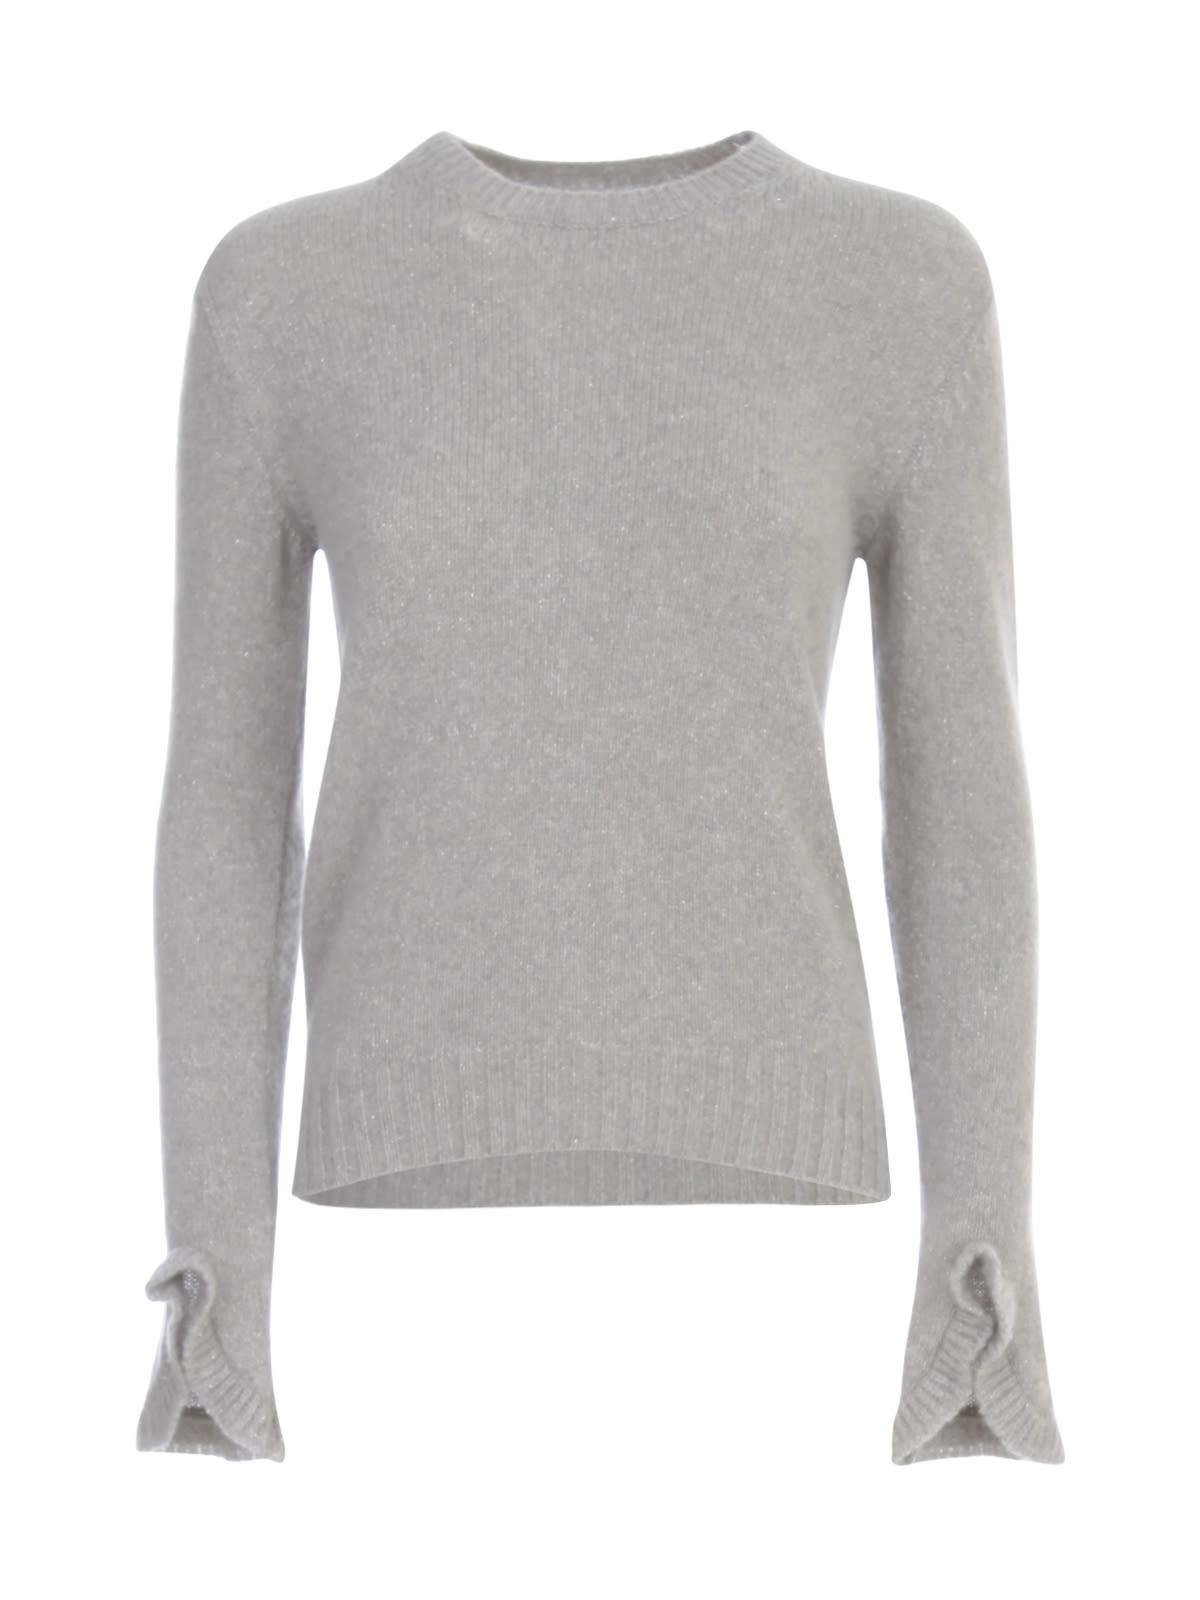 Philosophy di Lorenzo Serafini L/s Sweater High Neck